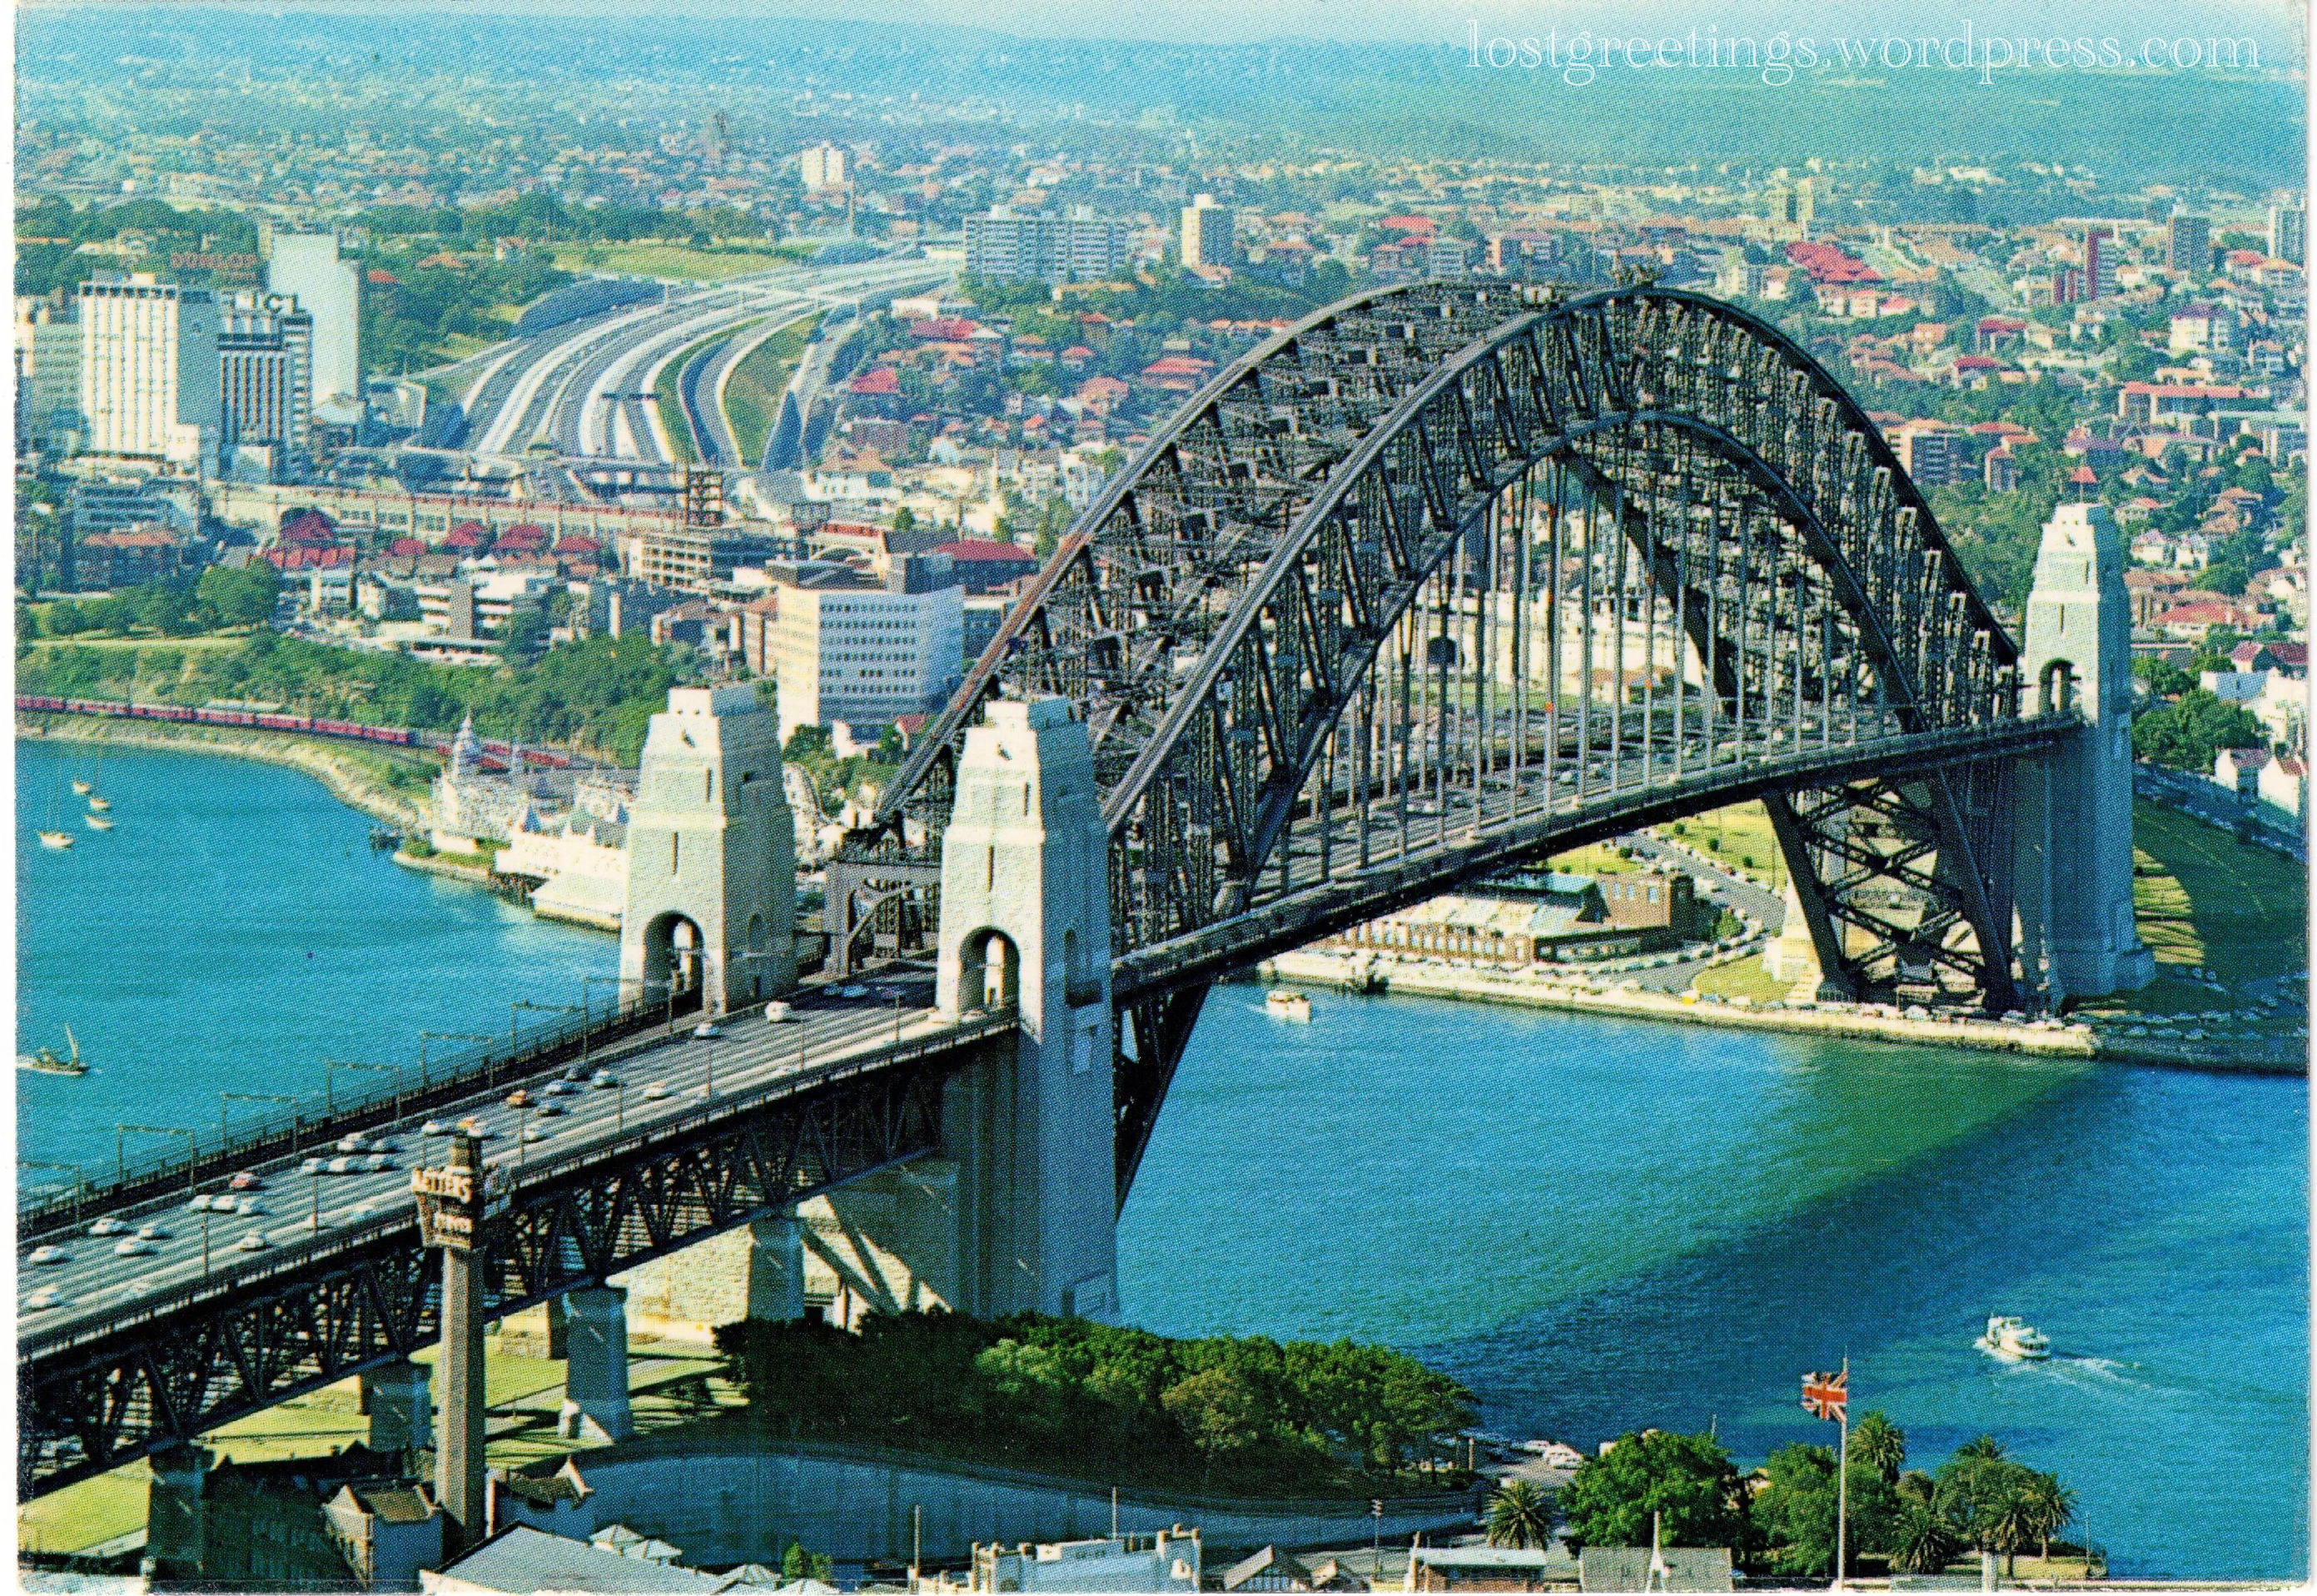 1971 Travel Postcard Image - Sydney, Australia lg